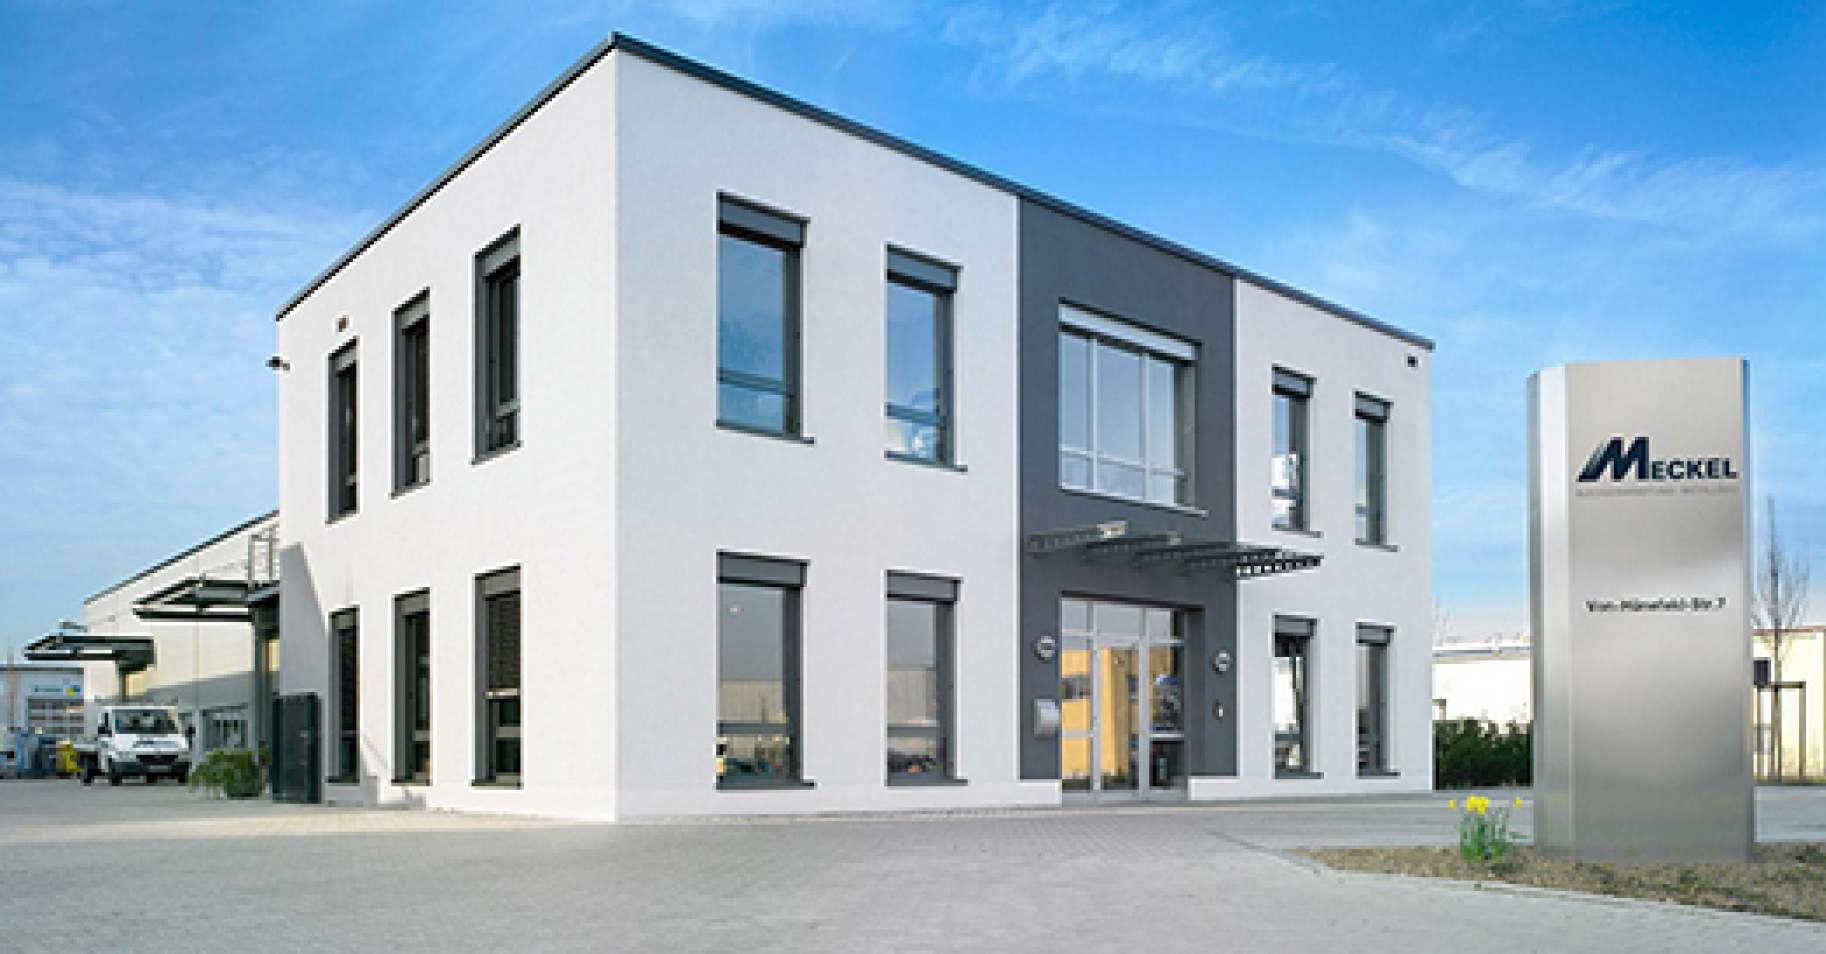 Meckel GmbH Blechverarbeitung - Metallbau